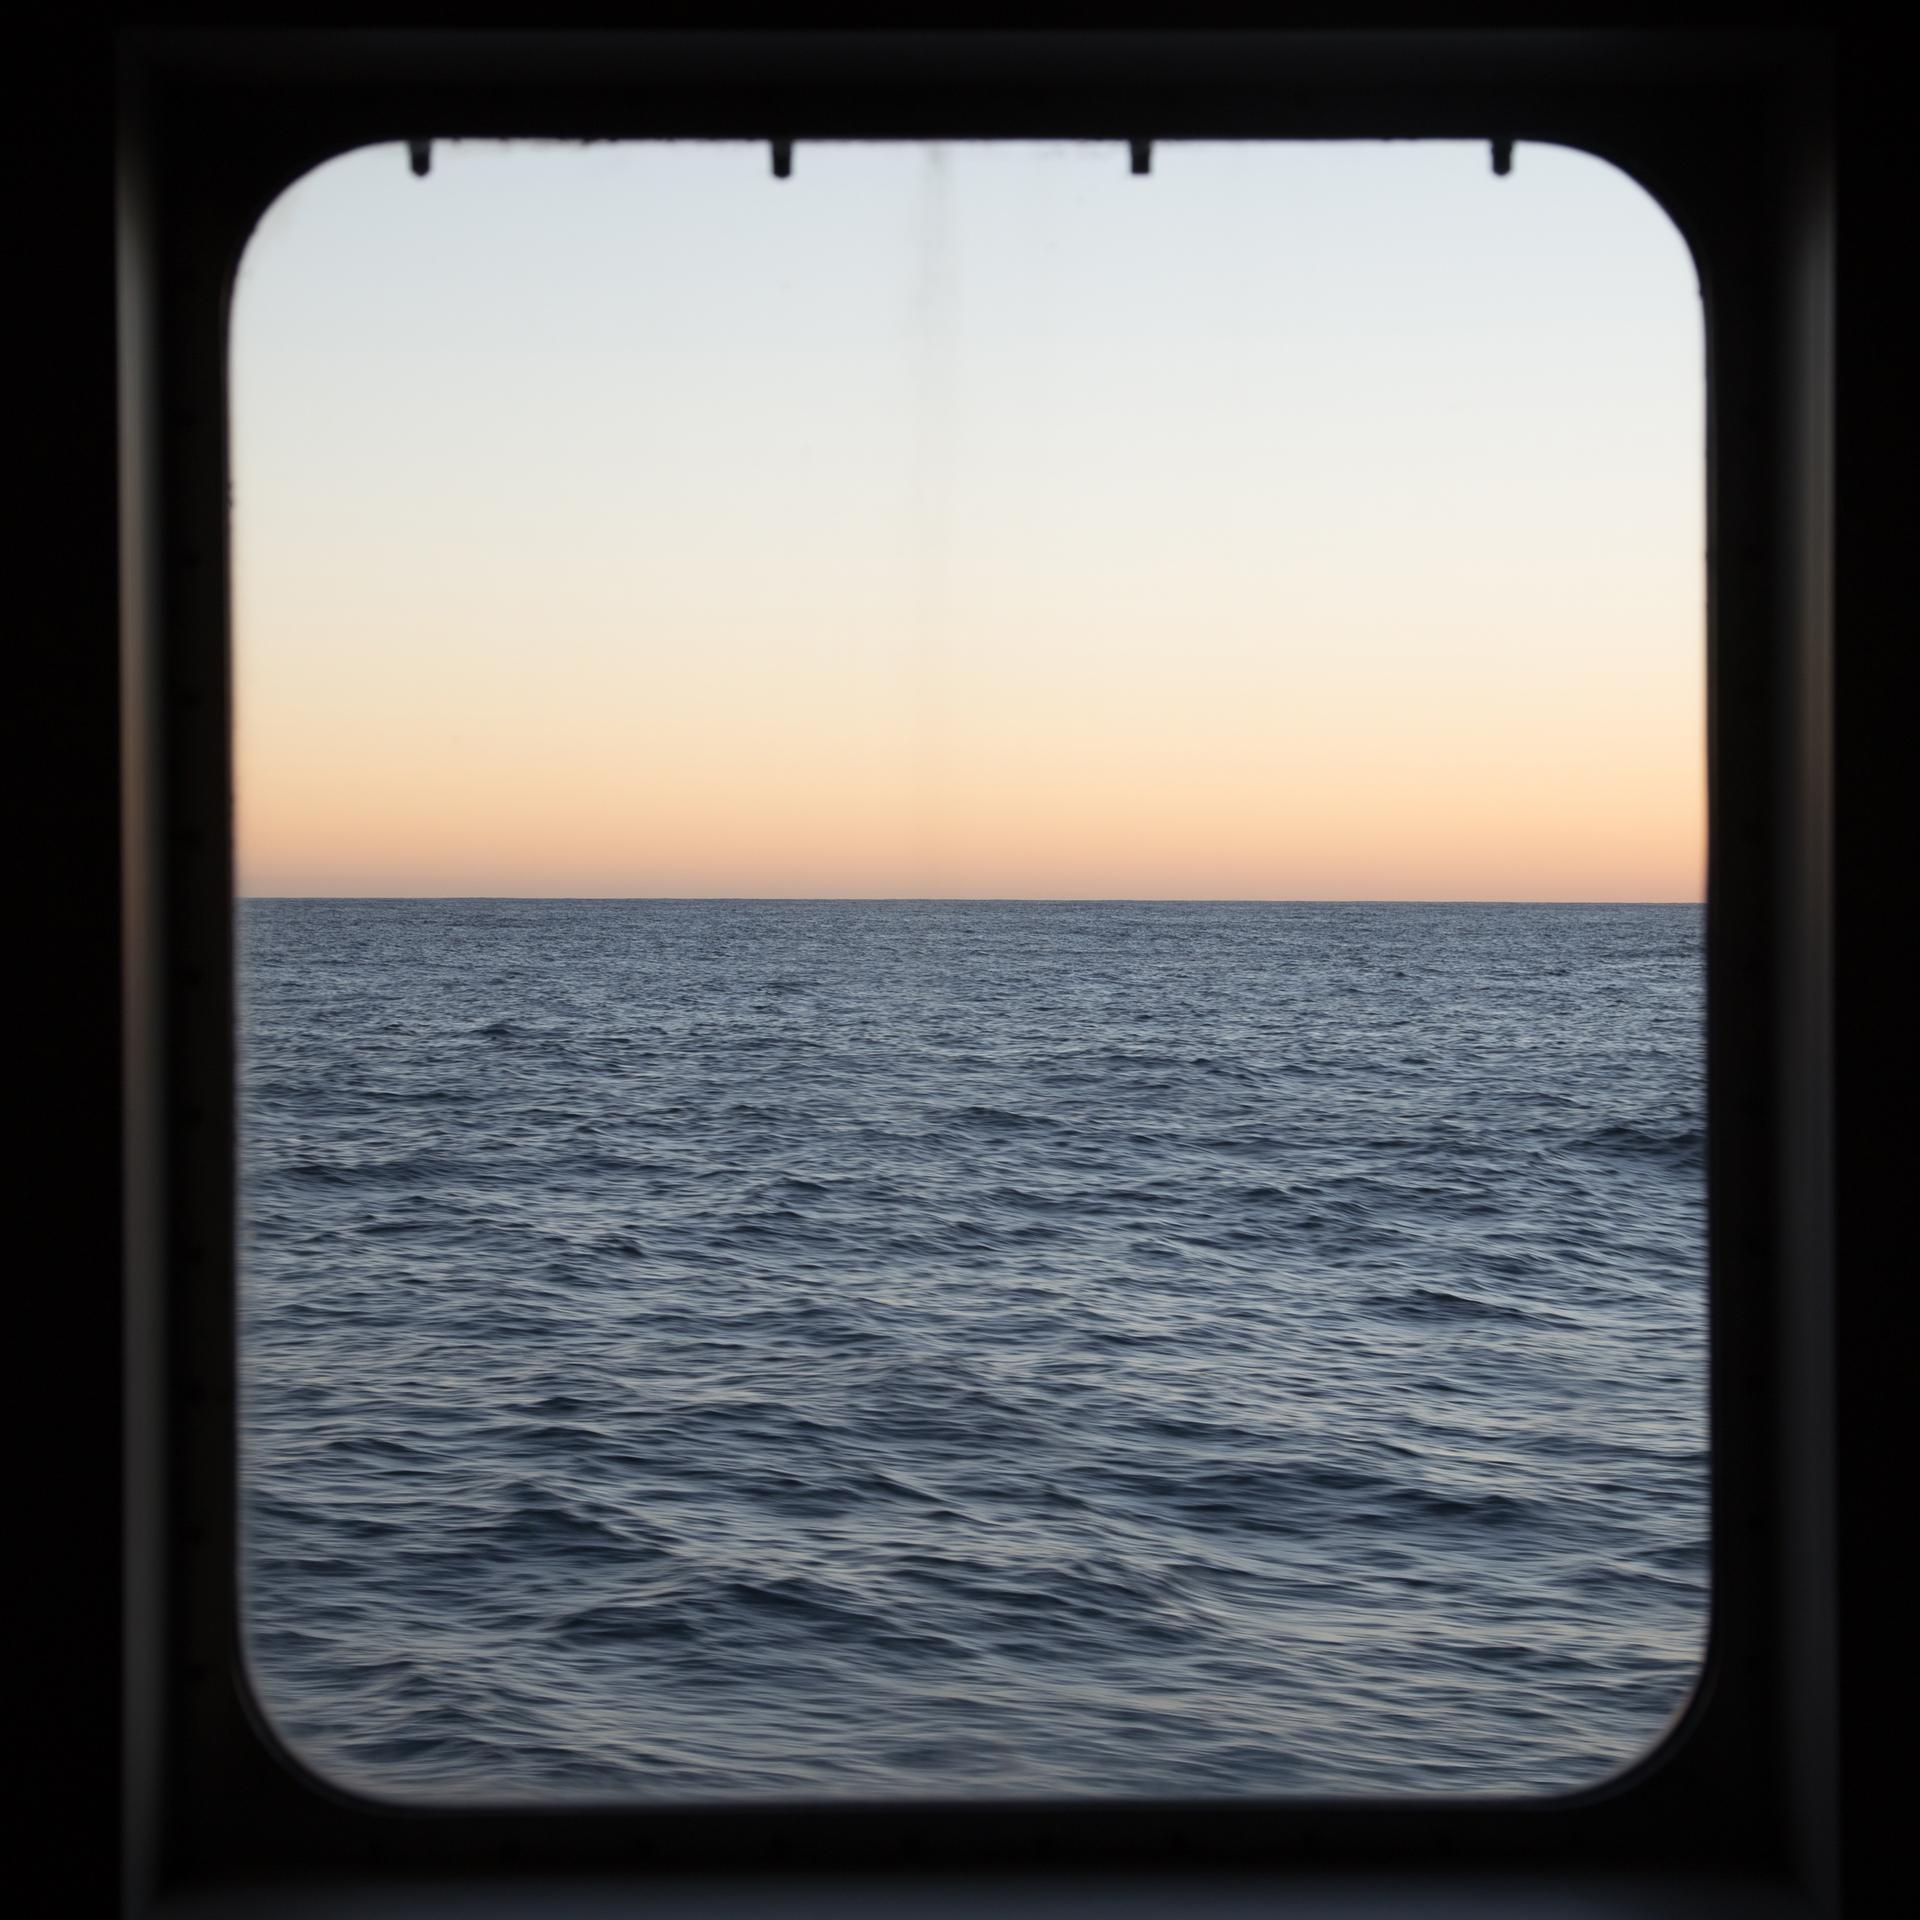 "Sight Lines: 29°54"", 15°50"""